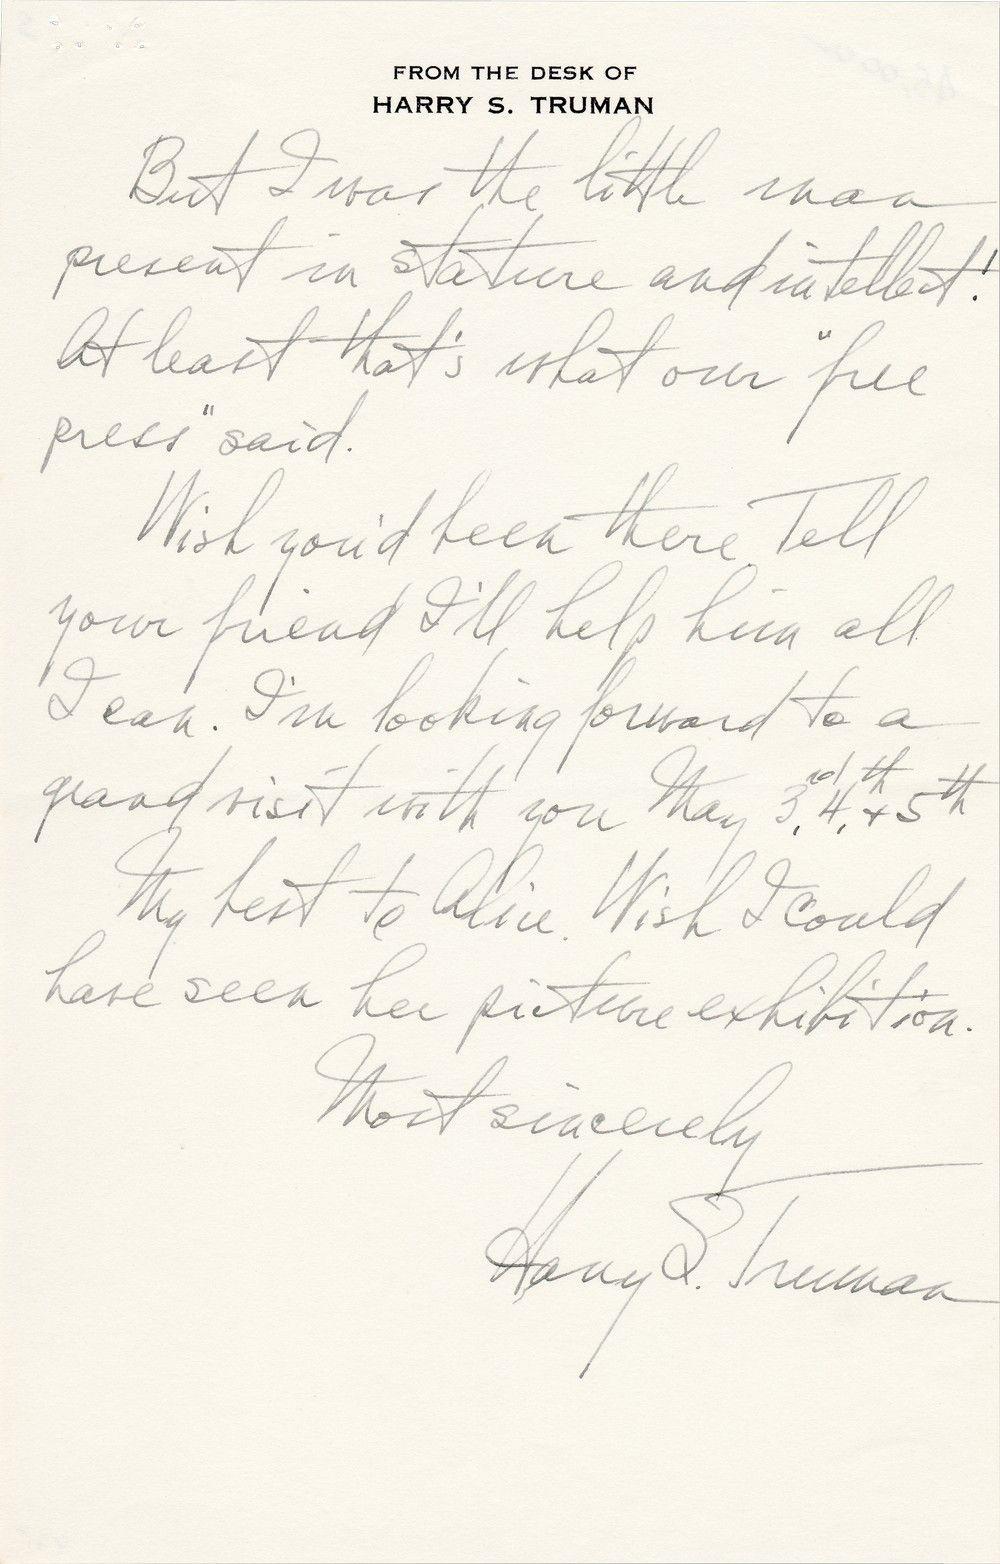 Page 8 transcript